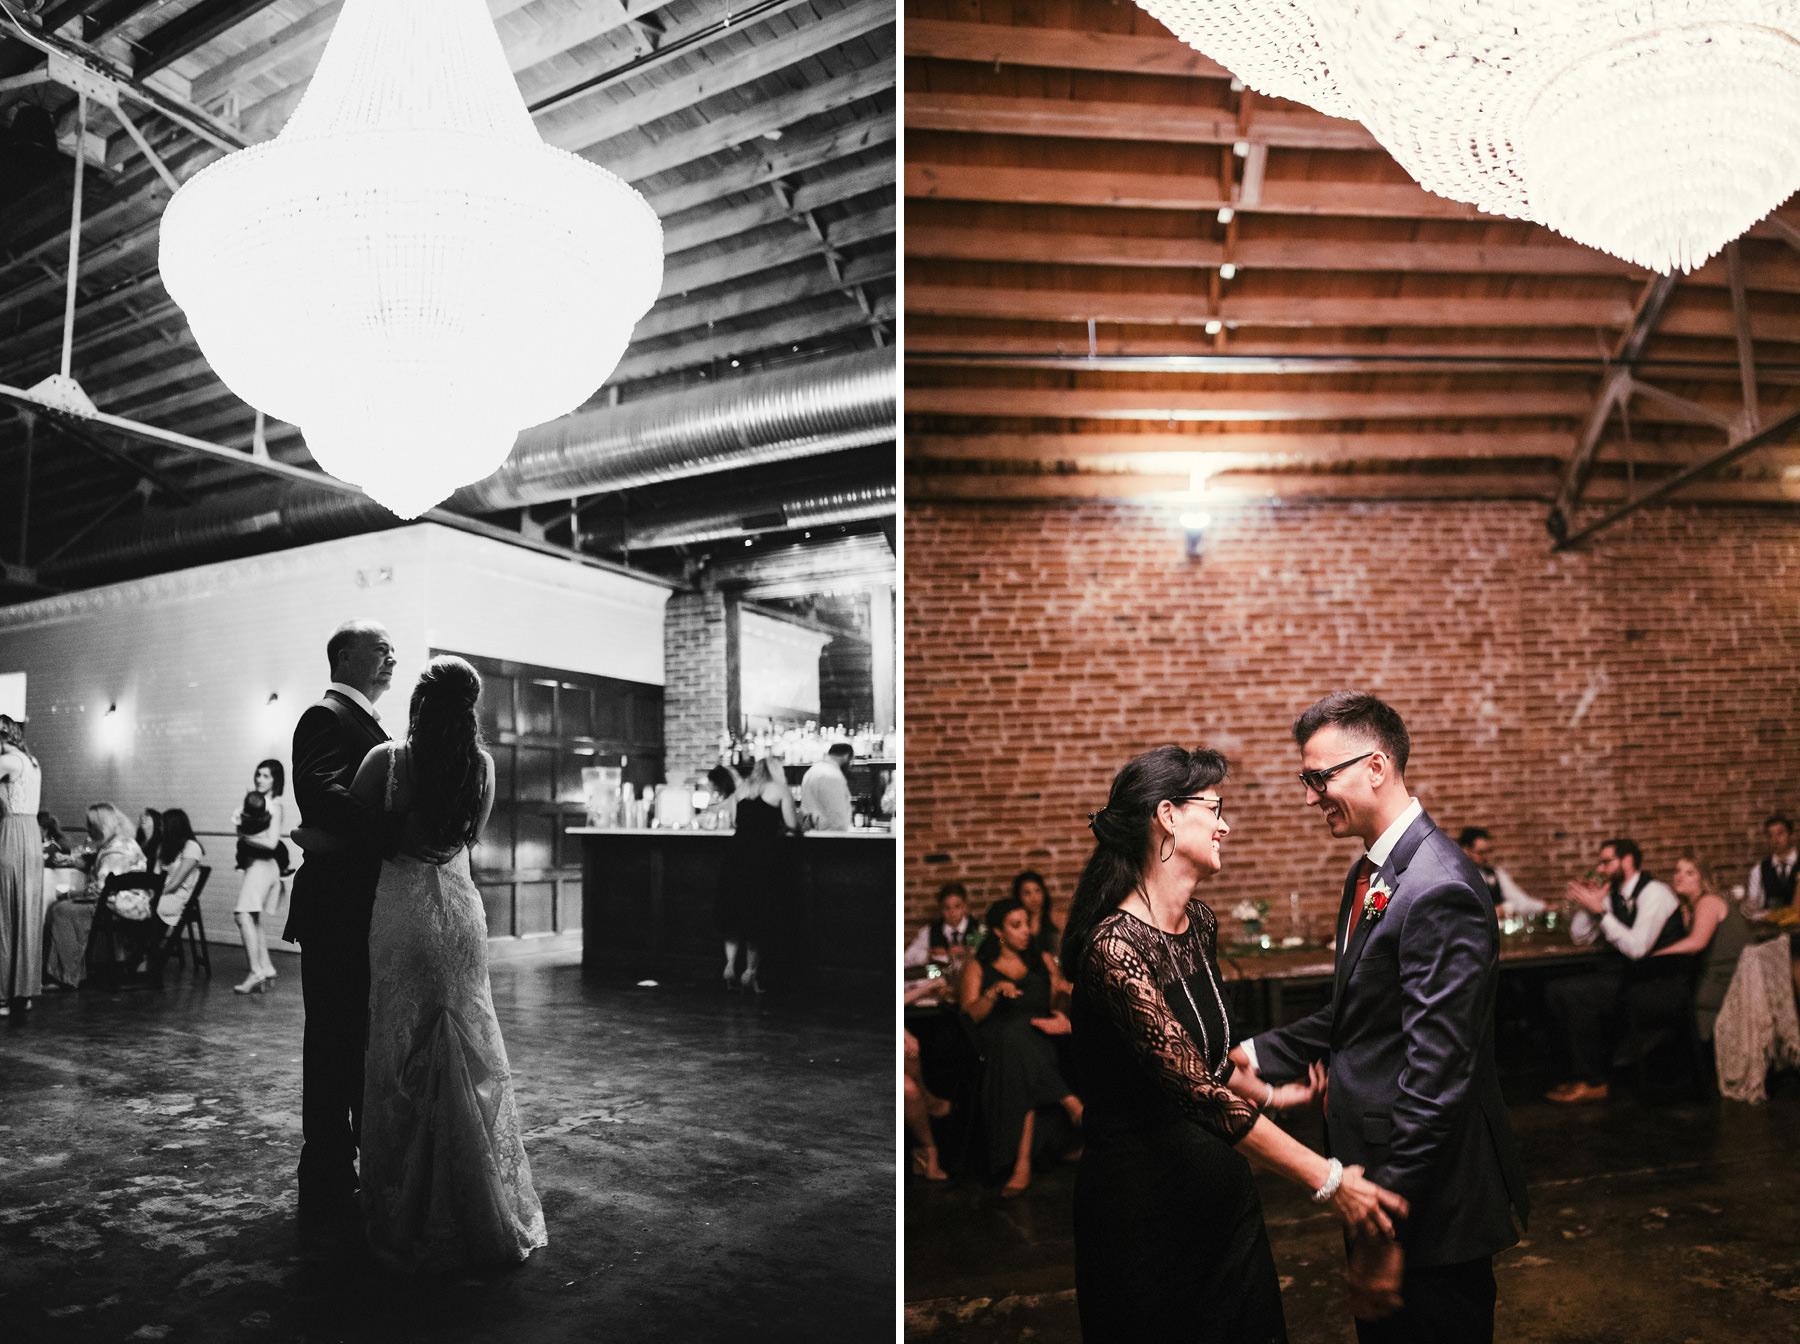 Kansas City Summer Wedding at the Guild_Kindling Wedding Photography Blog76.JPG